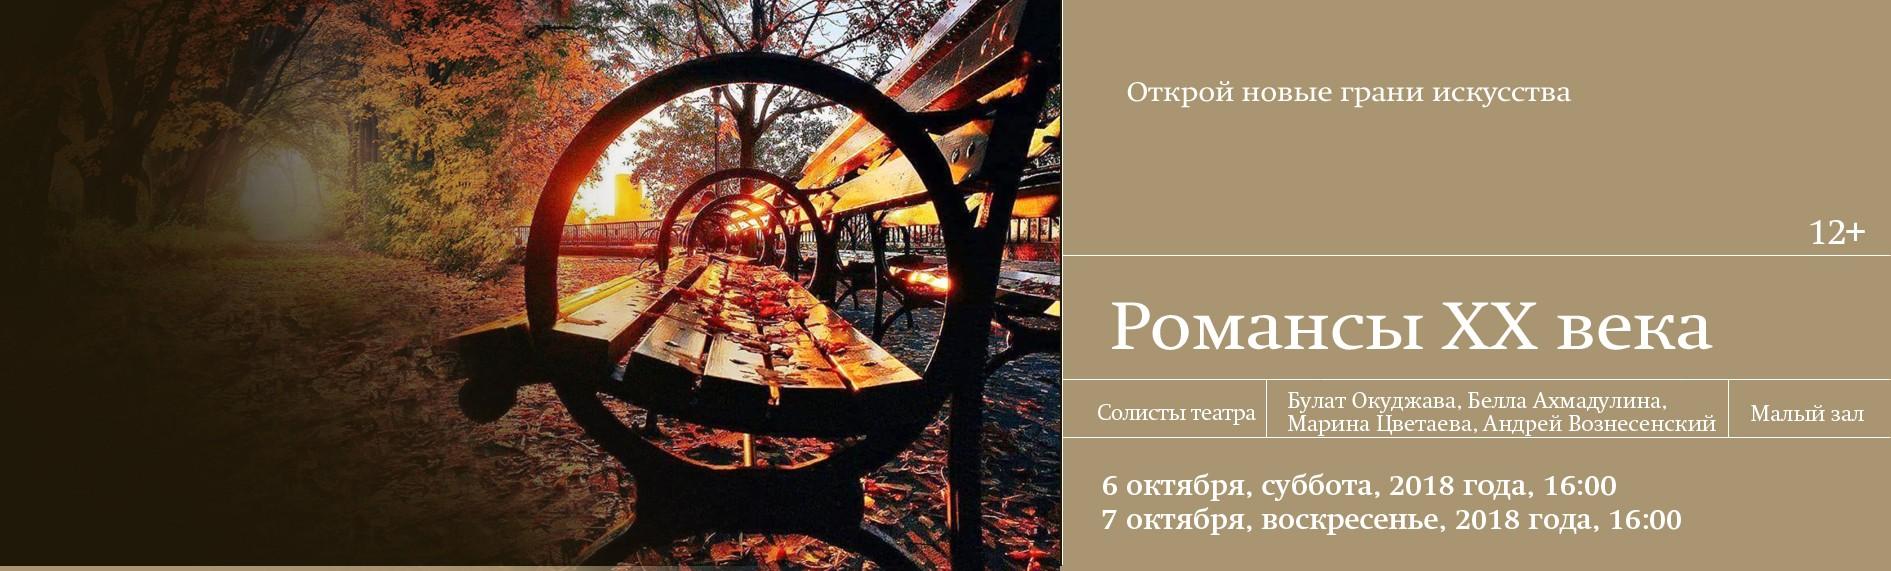 Концерт «Романсы 20 века»